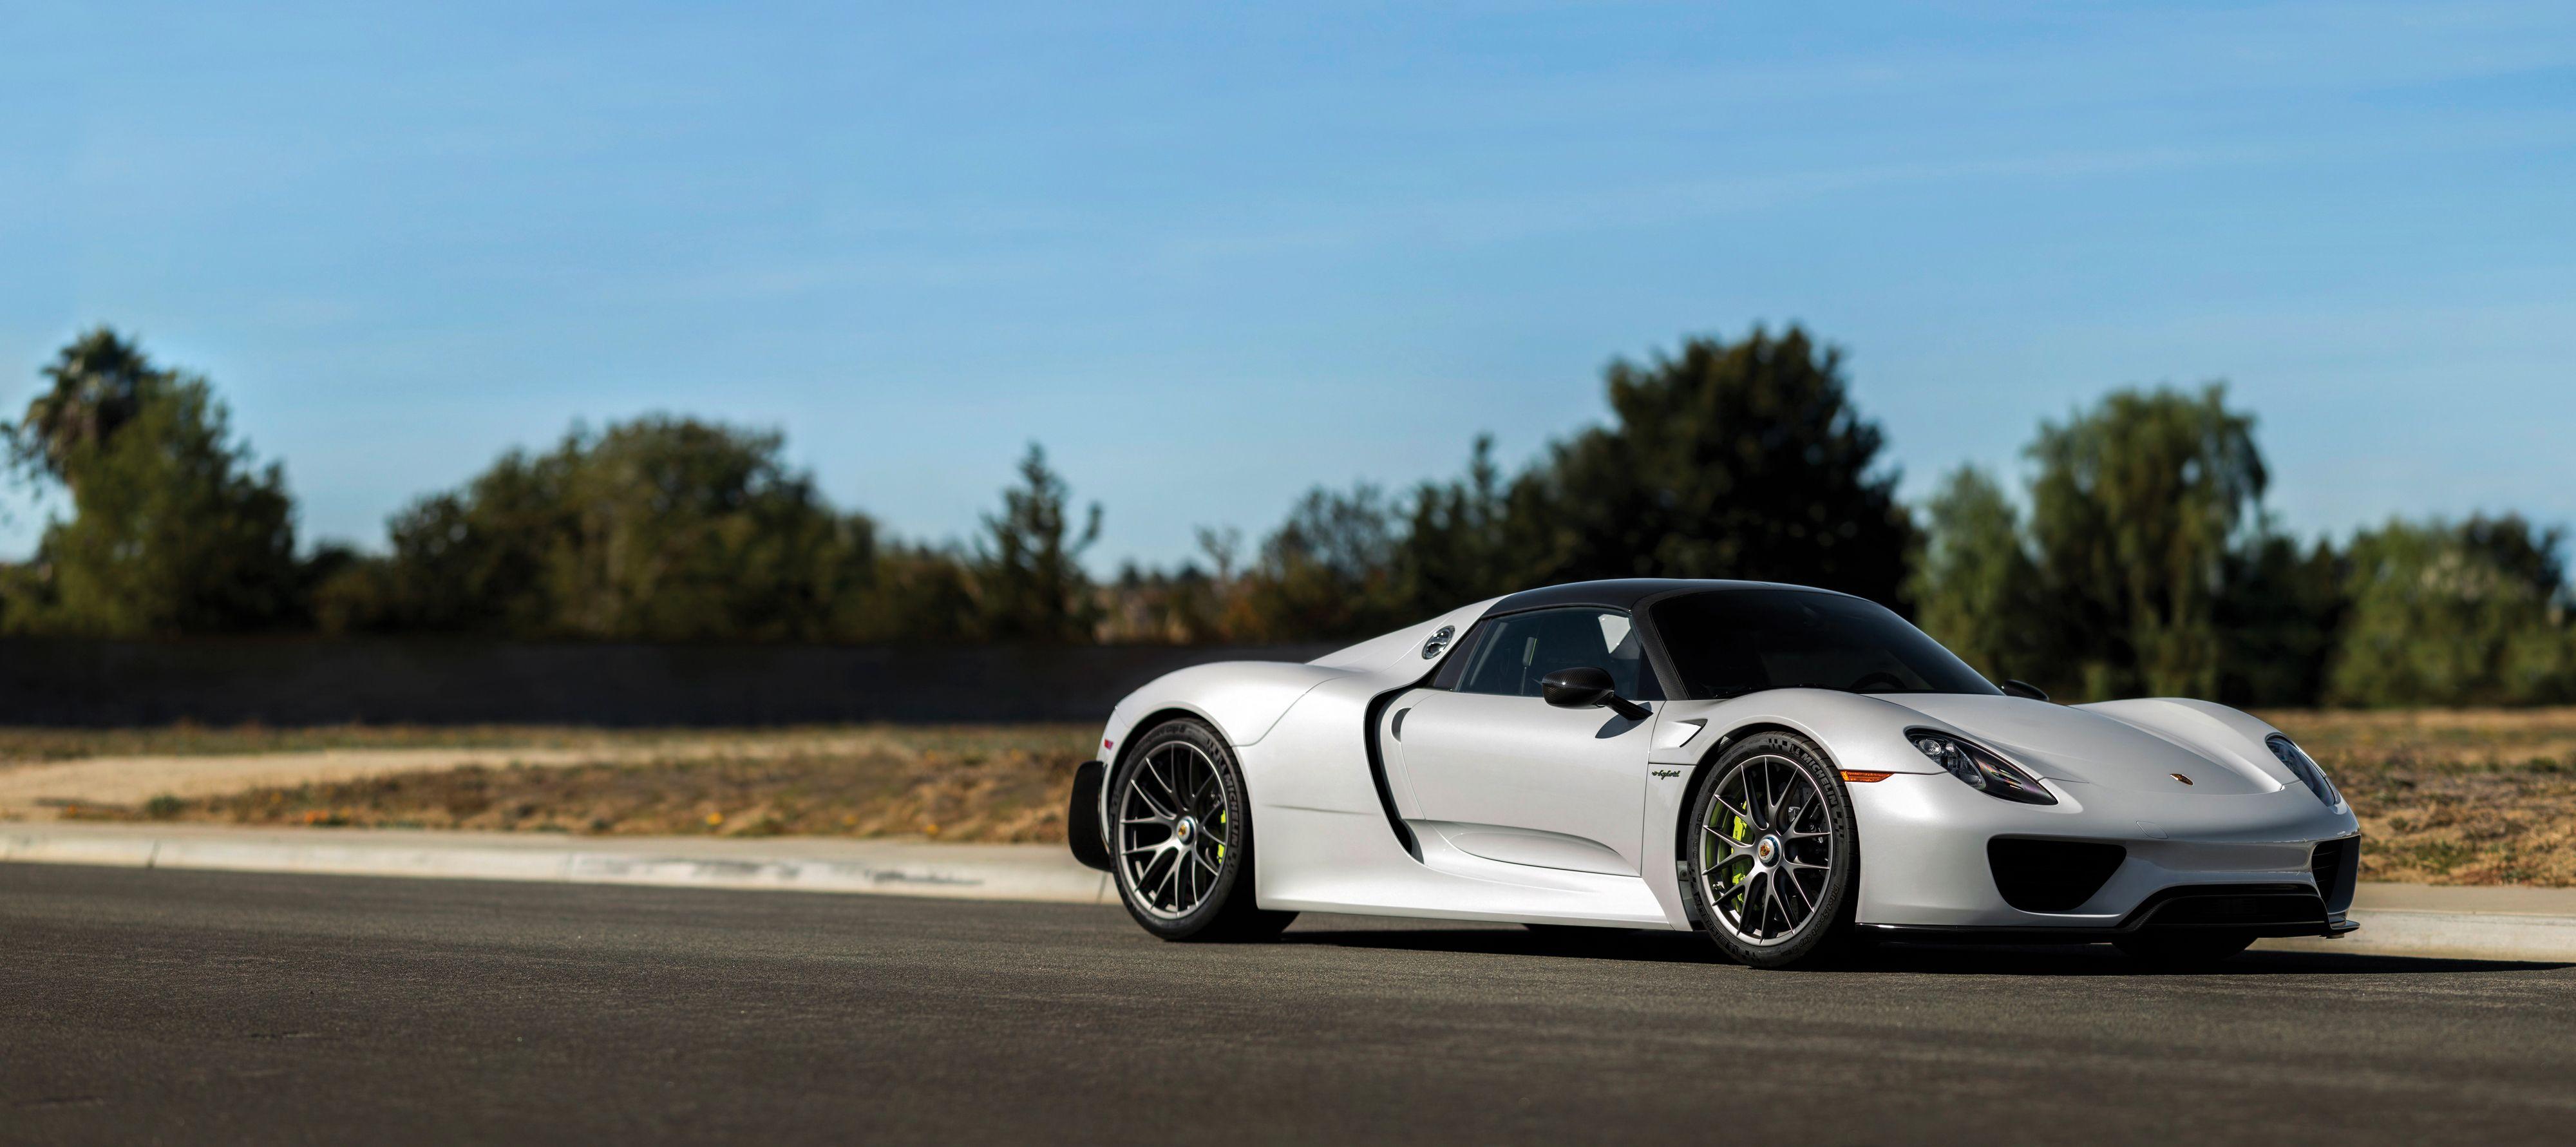 bdde55aa259c69036ad88289a2a755a1 Elegant Porsche 918 Spyder Los Angeles Cars Trend